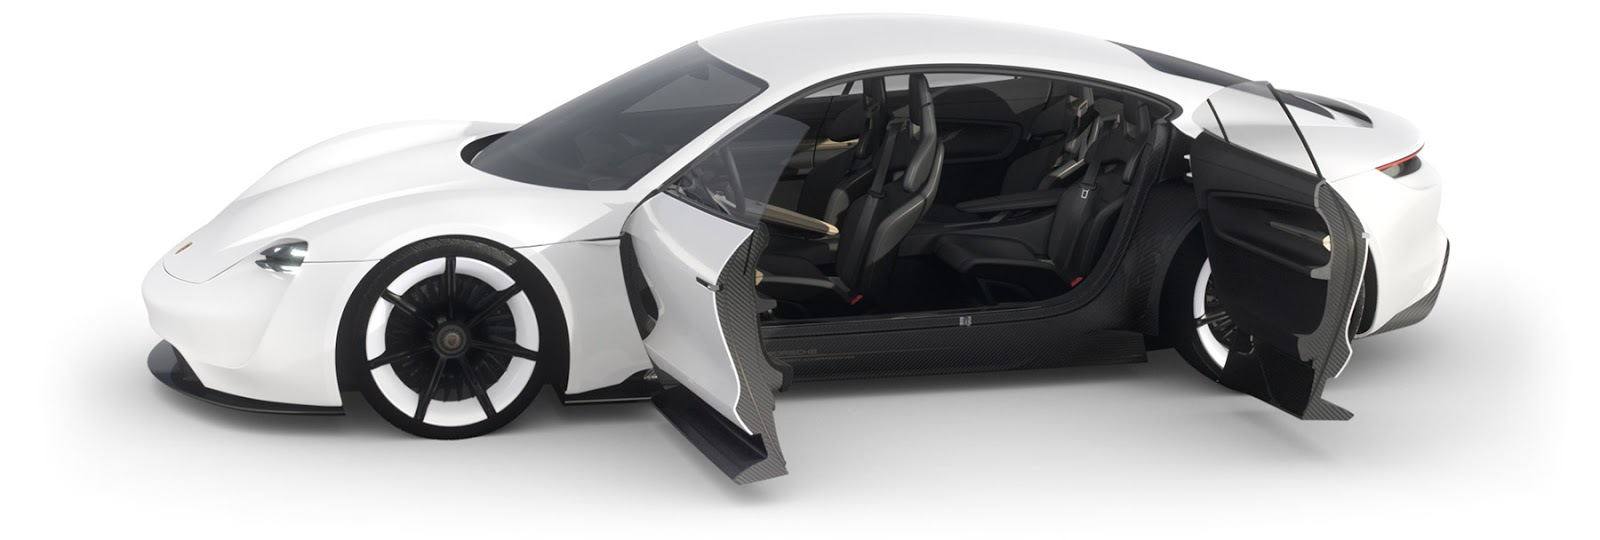 clip 26 Σε τρία χρόνια το πρώτο αποκλειστικά ηλεκτροκίνητο μοντέλο της Porsche Electric cars, Porsche, Porsche 919, Porsche Mission E, supercars, videos, Τεχνολογία